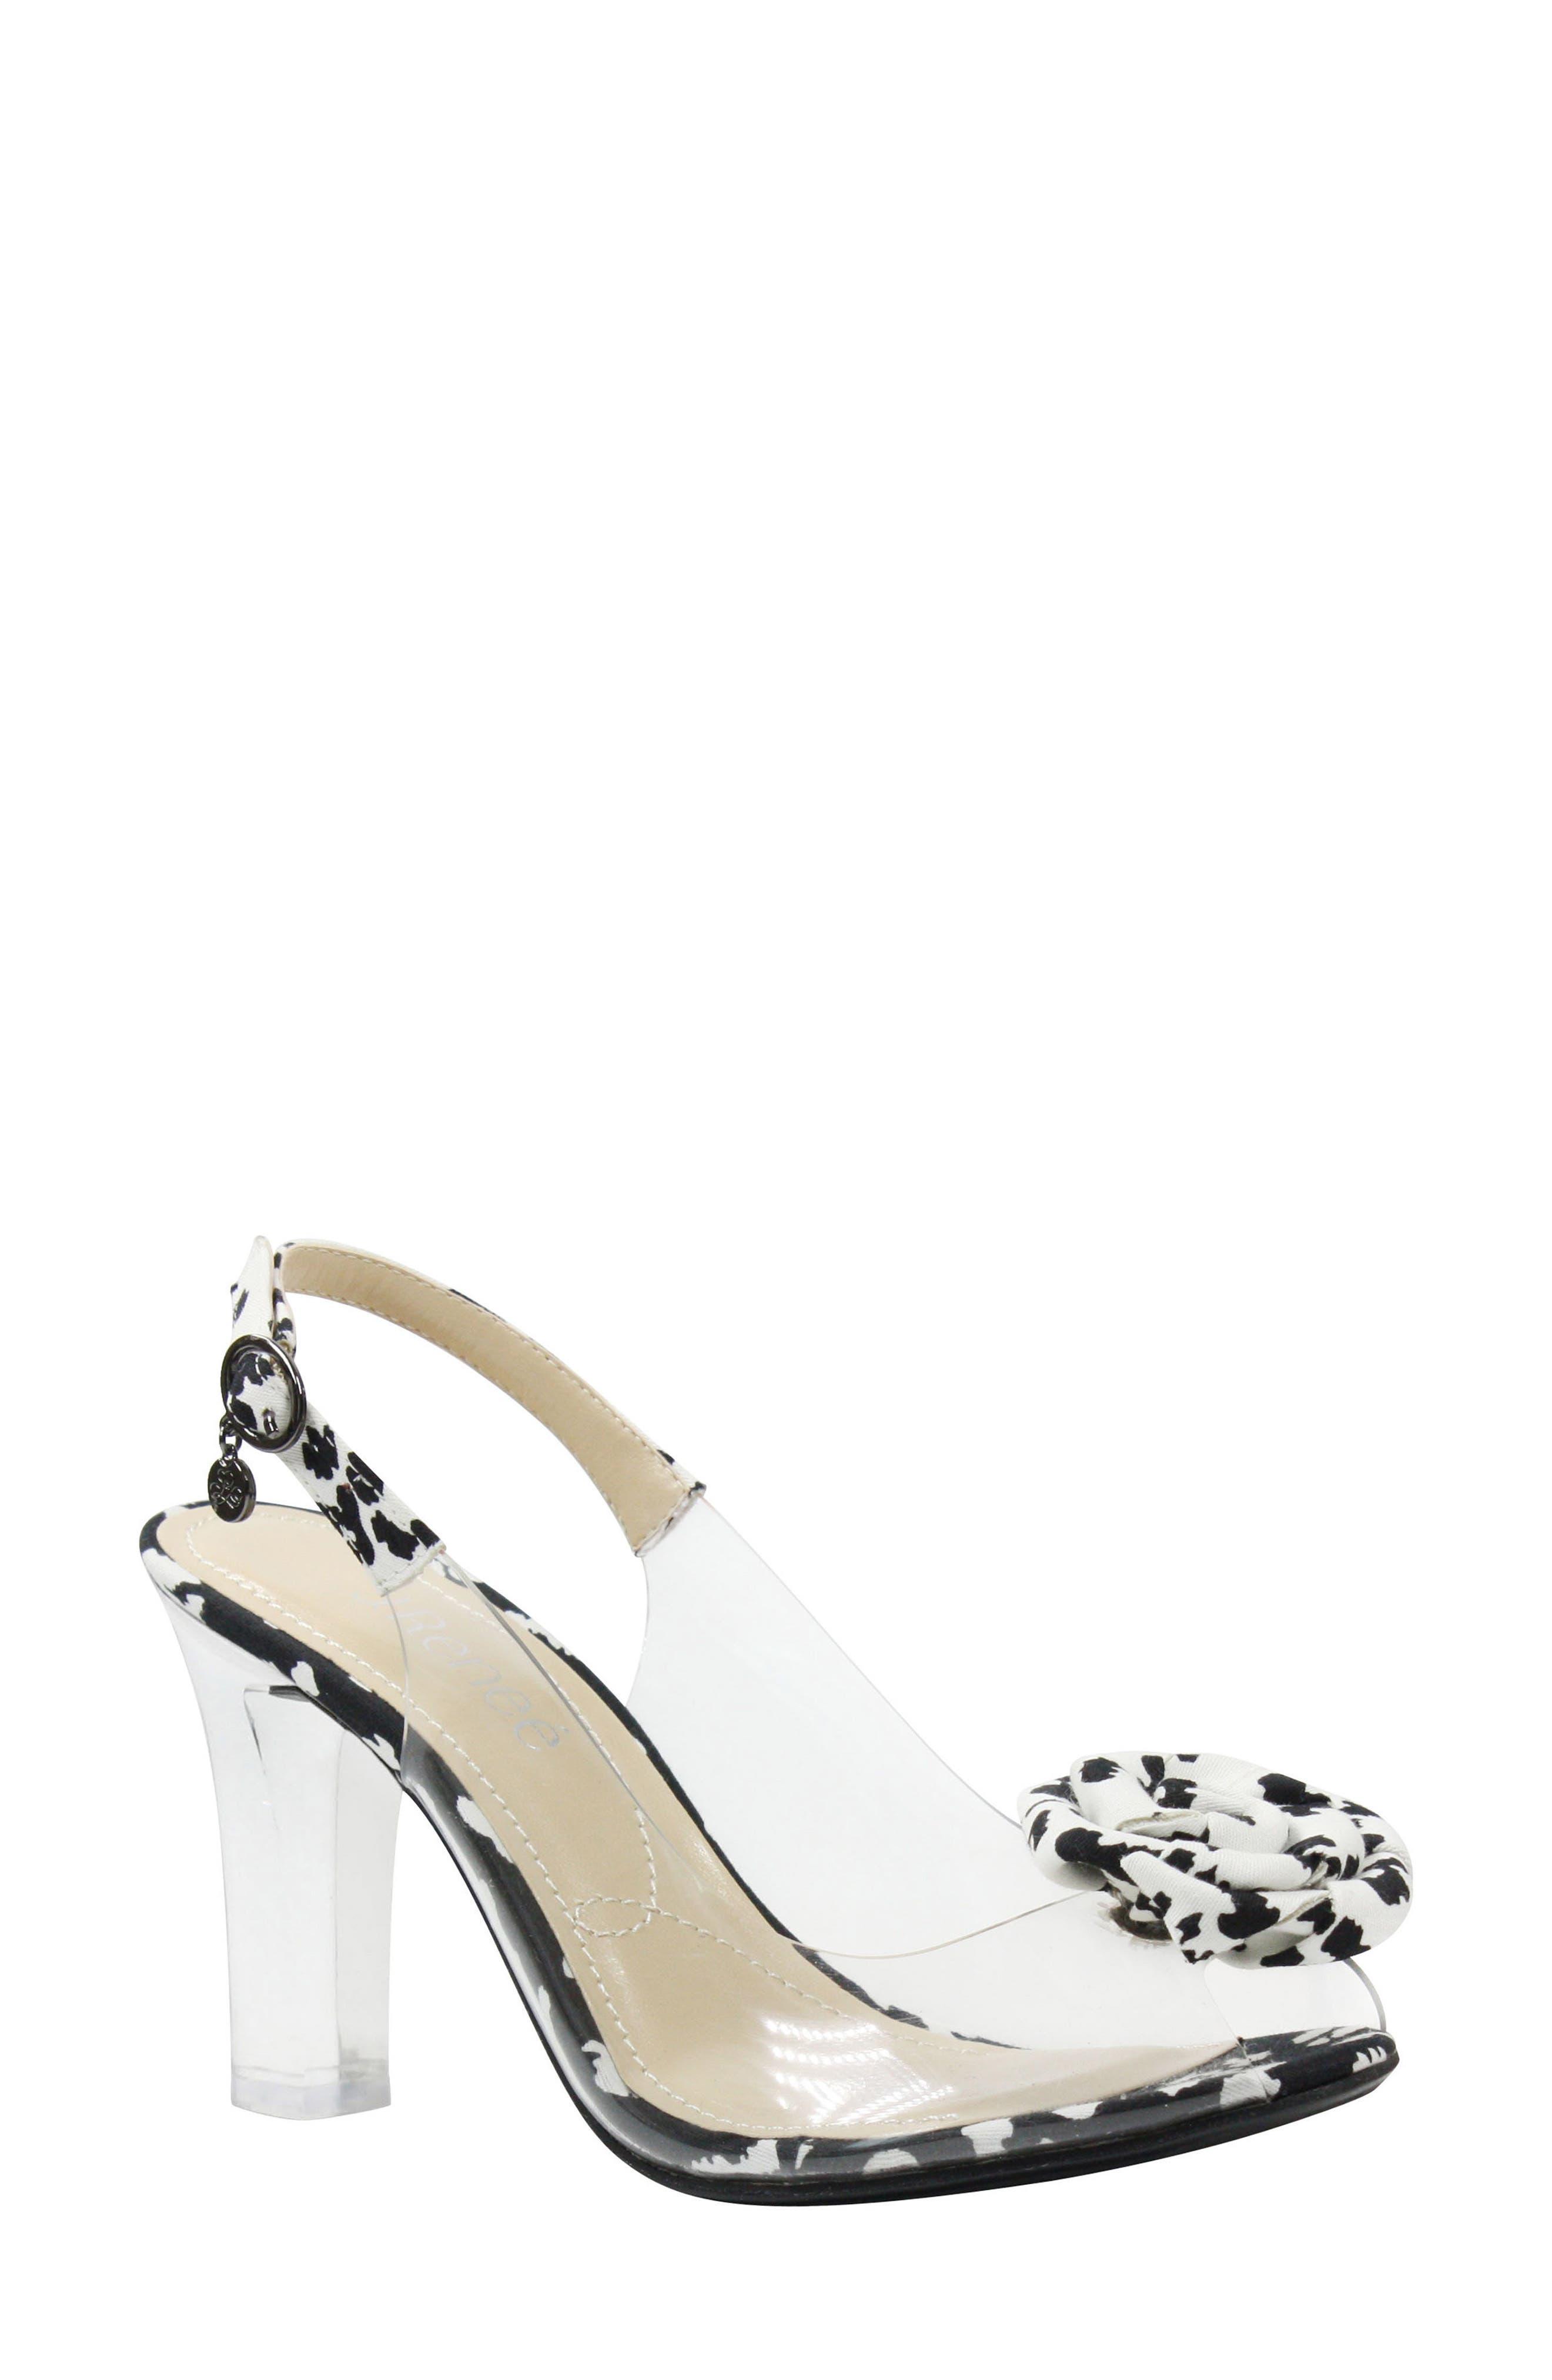 Adoracion Slingback Sandal,                             Main thumbnail 1, color,                             CLEAR/ BLACK/ WHITE